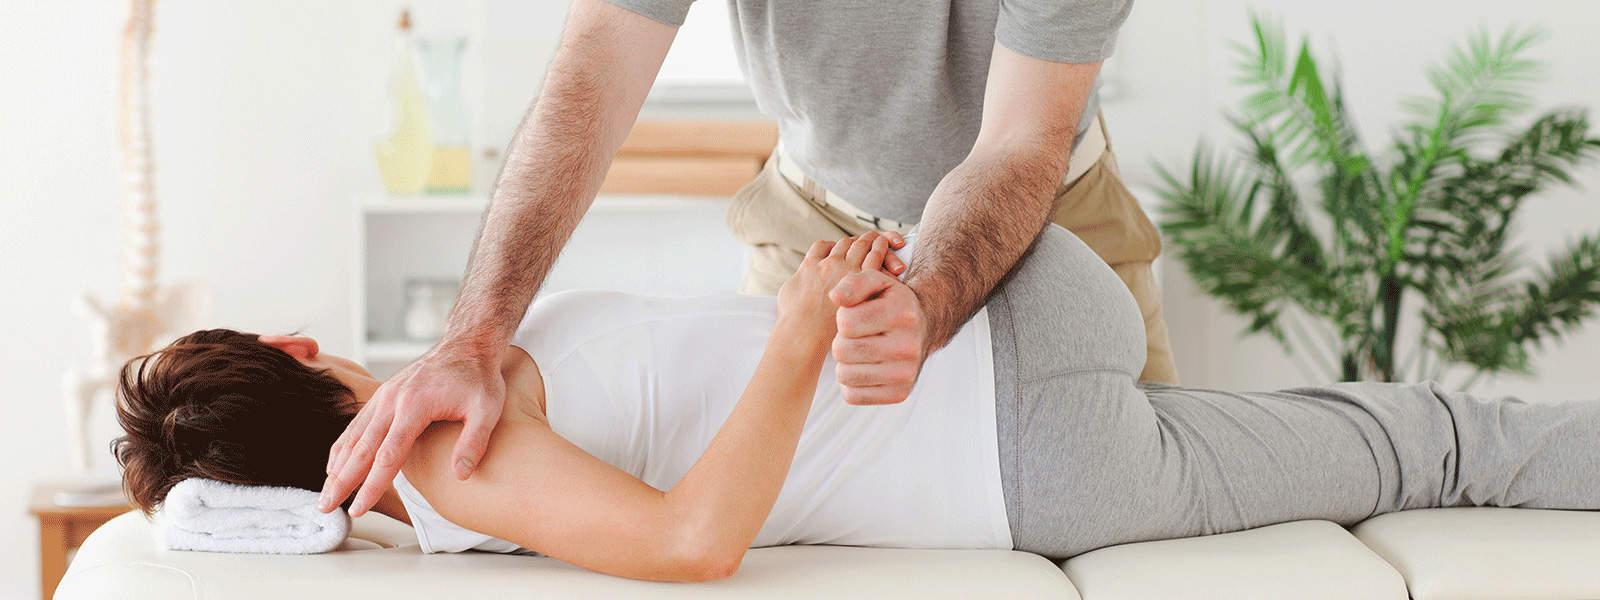 Où envoyer sa facture d'ostéopathie ?